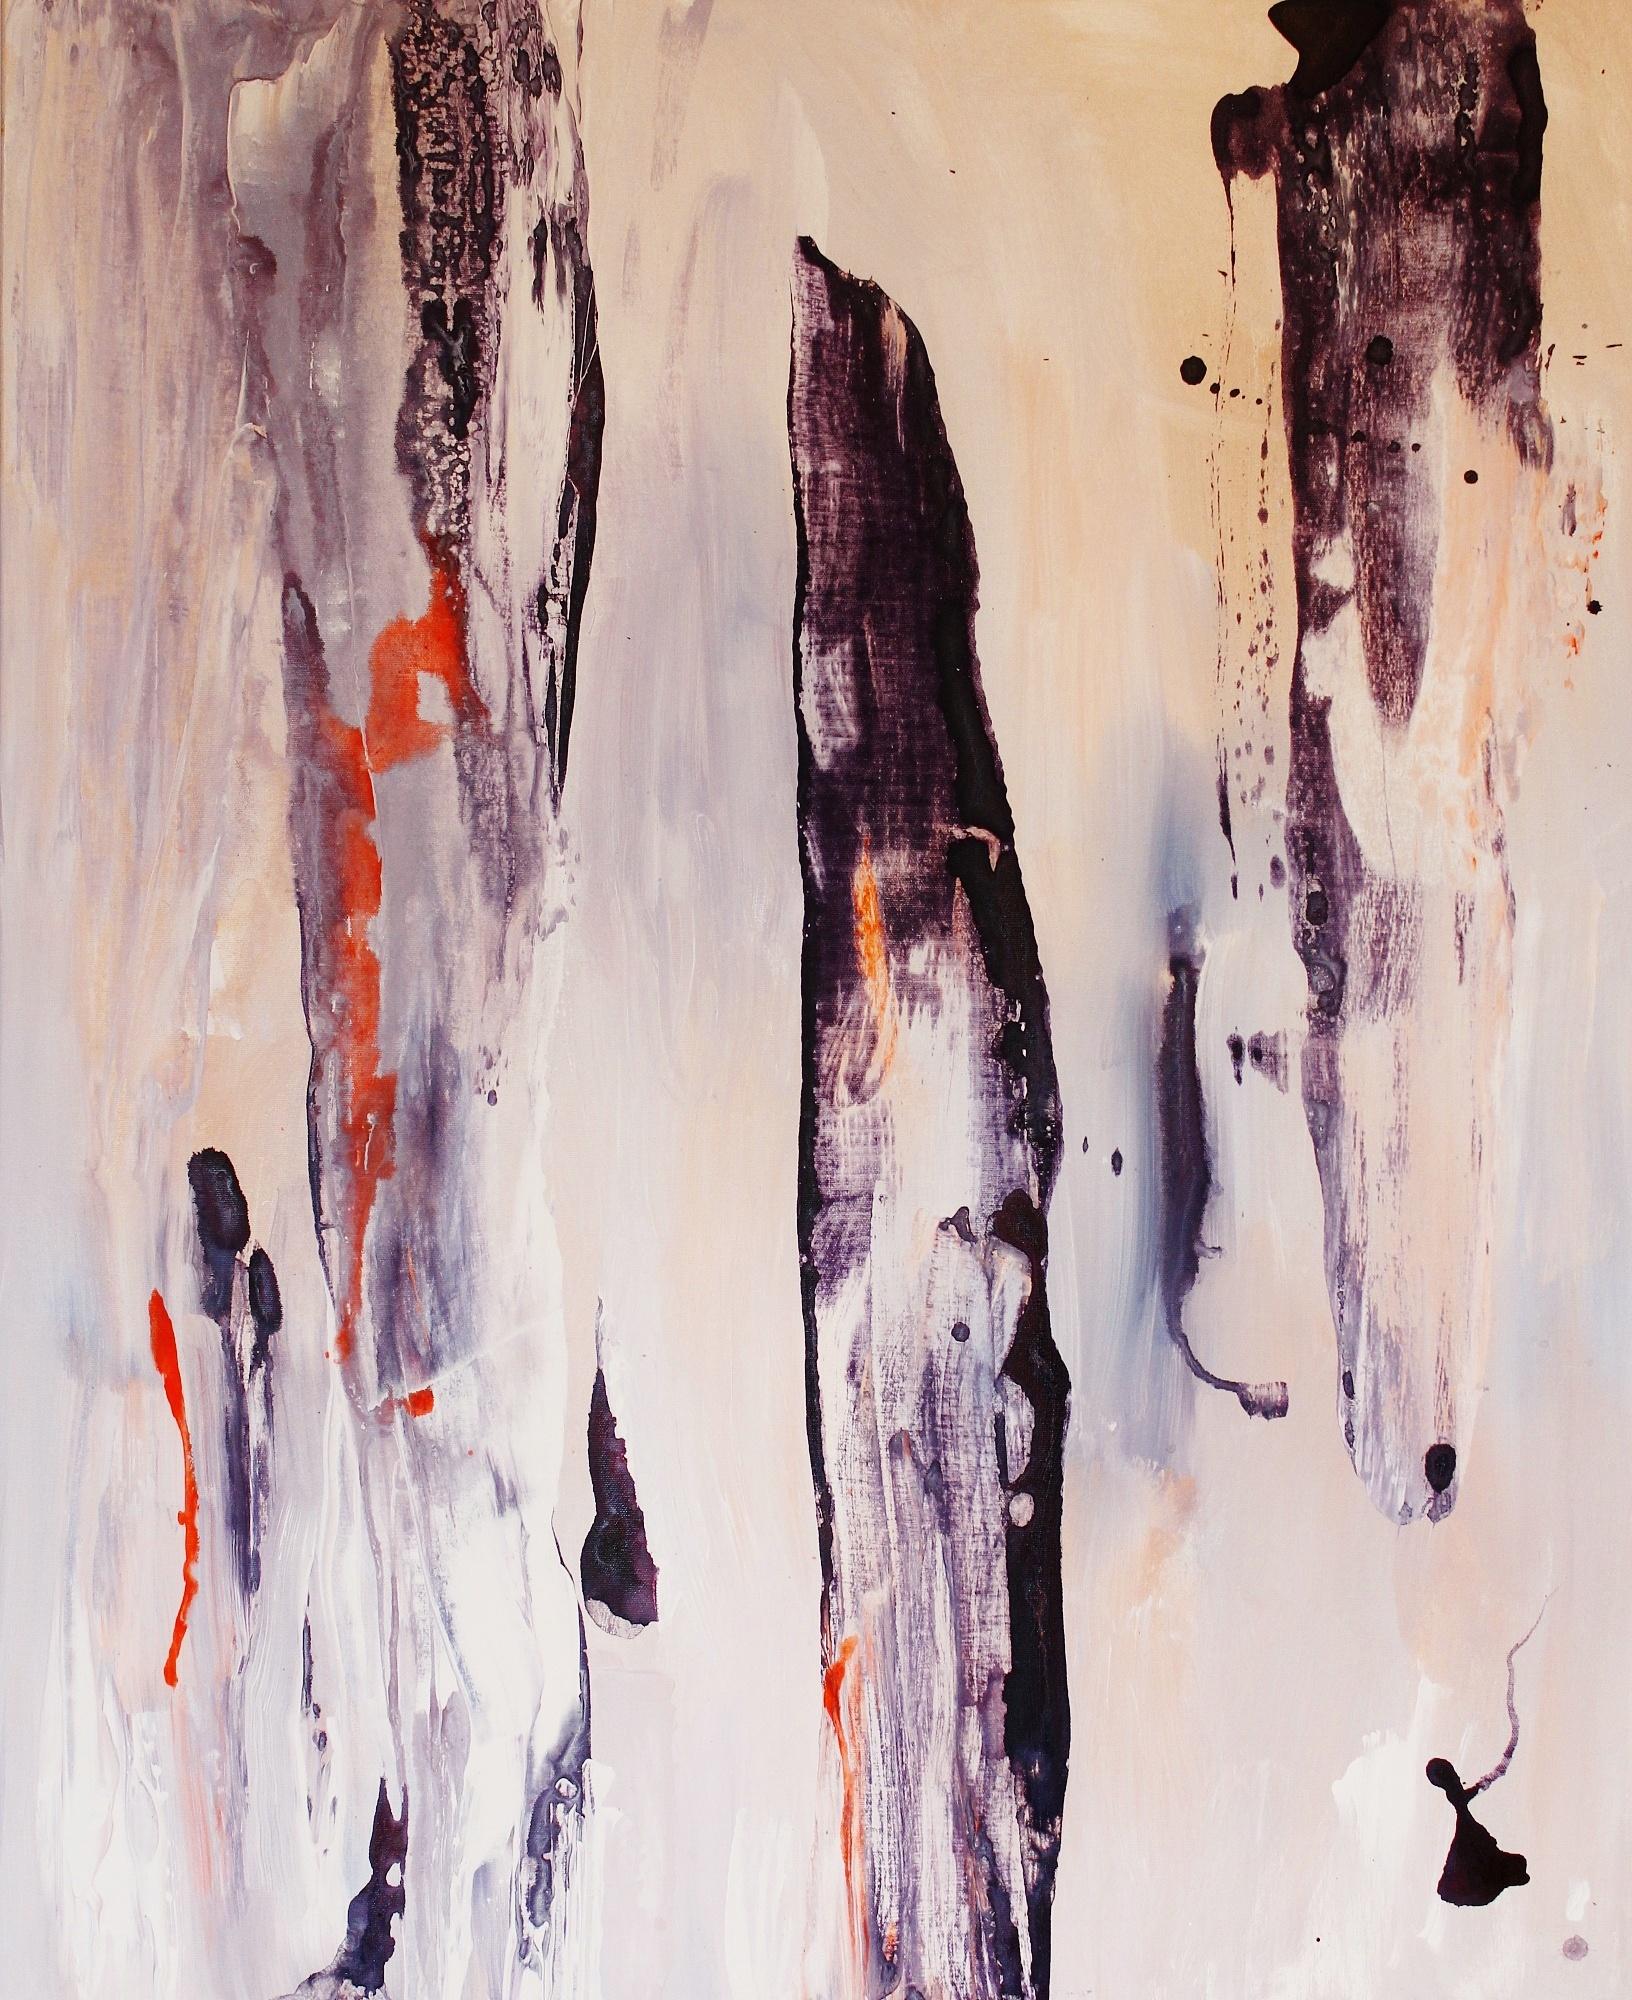 Yhteen rungot hamuaa, Akryyli kankaalle, 100 cm x 80 cm  Myyty / Sold